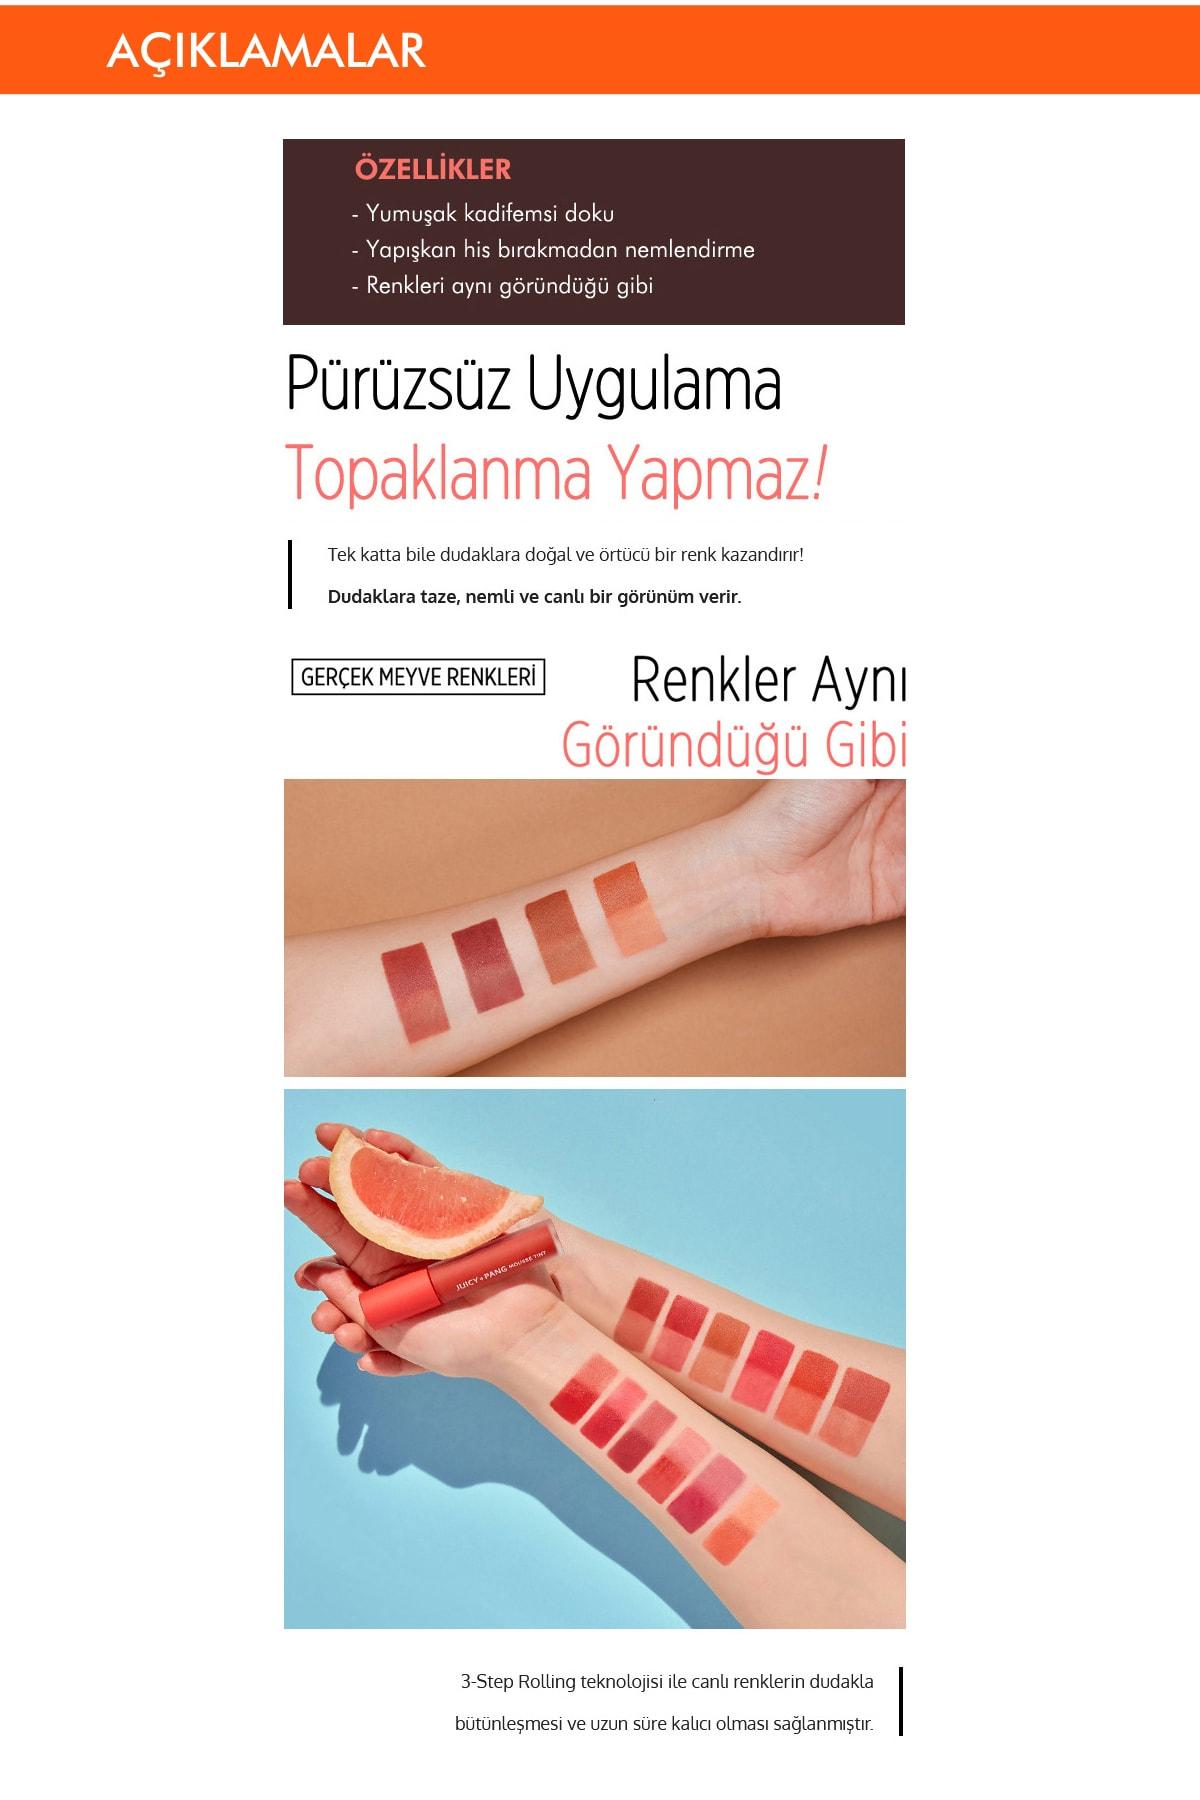 Missha Pürüzsüz Görünüm Sunan Kalıcı Köpük Tint Ruj APIEU Juicy Pang Mousse Tint (RD05) 3